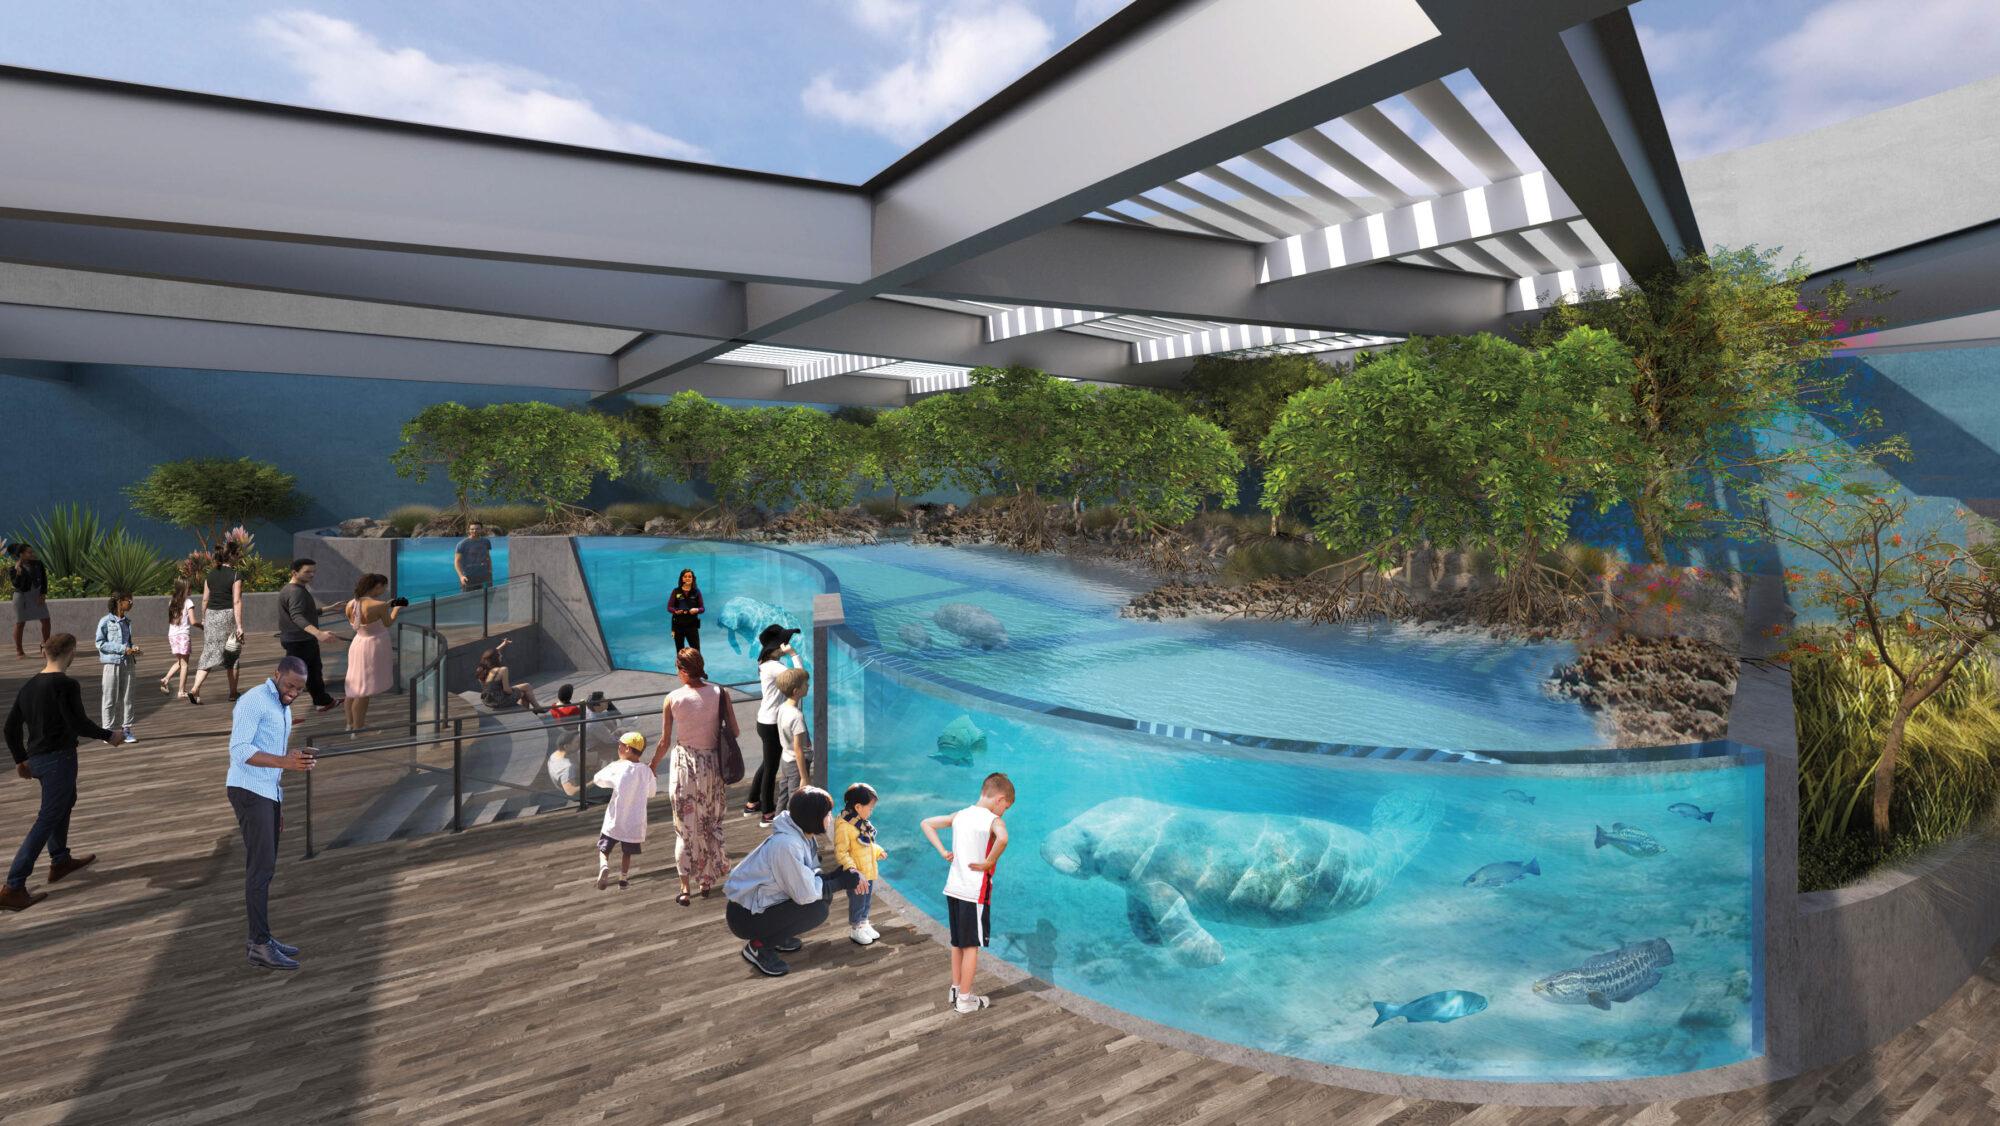 Rendering of an aquarium with manatees